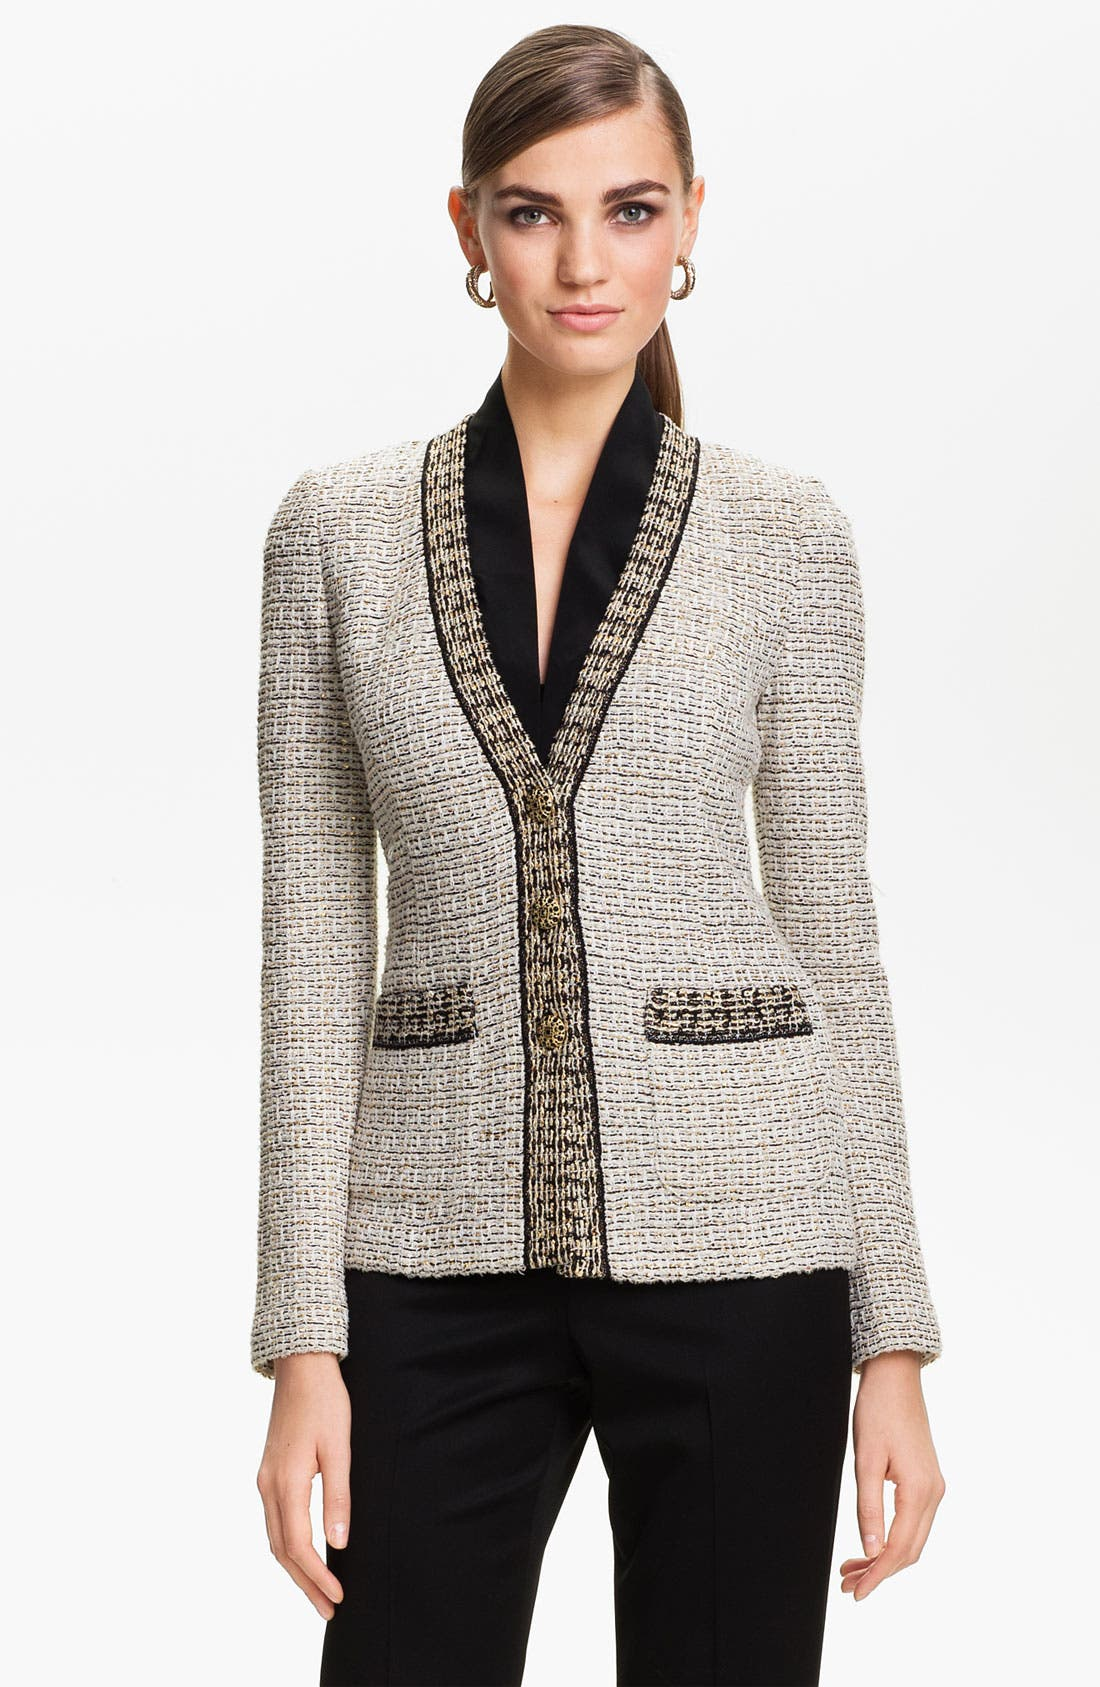 Main Image - St. John Collection Venezia Tweed Knit Jacket